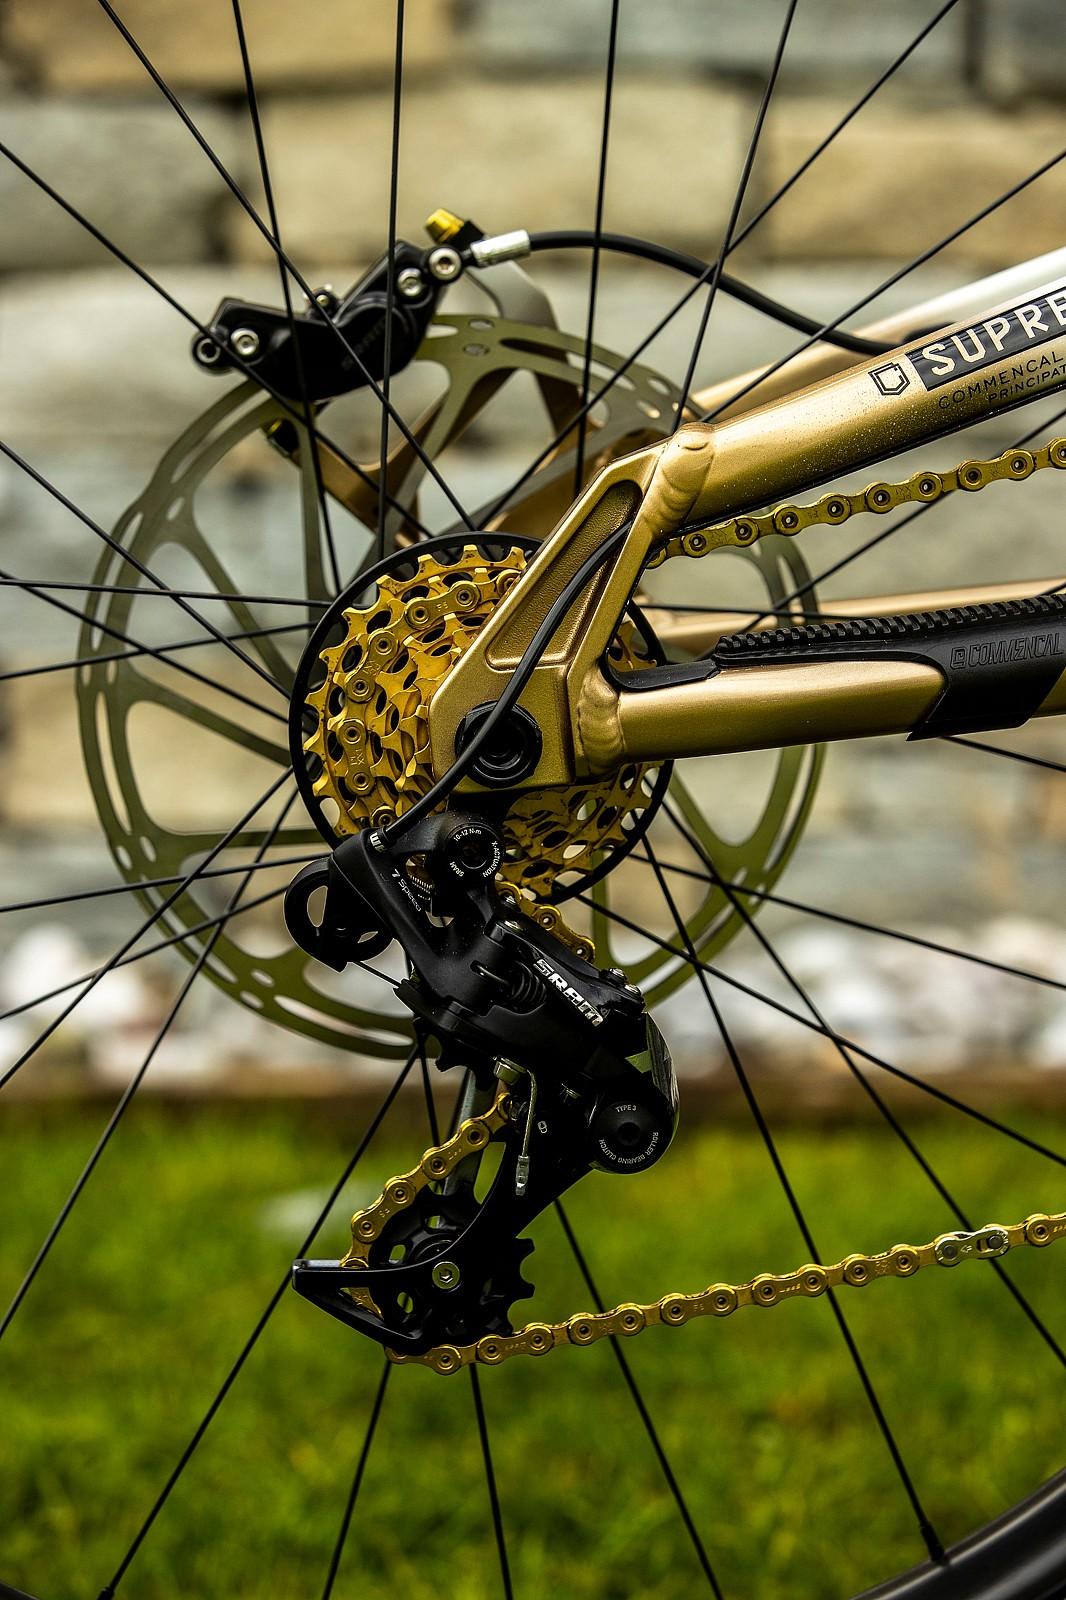 Blingtastic - WORLD CHAMPS BIKE - Myriam Nicole's Commencal Supreme - Mountain Biking Pictures - Vital MTB